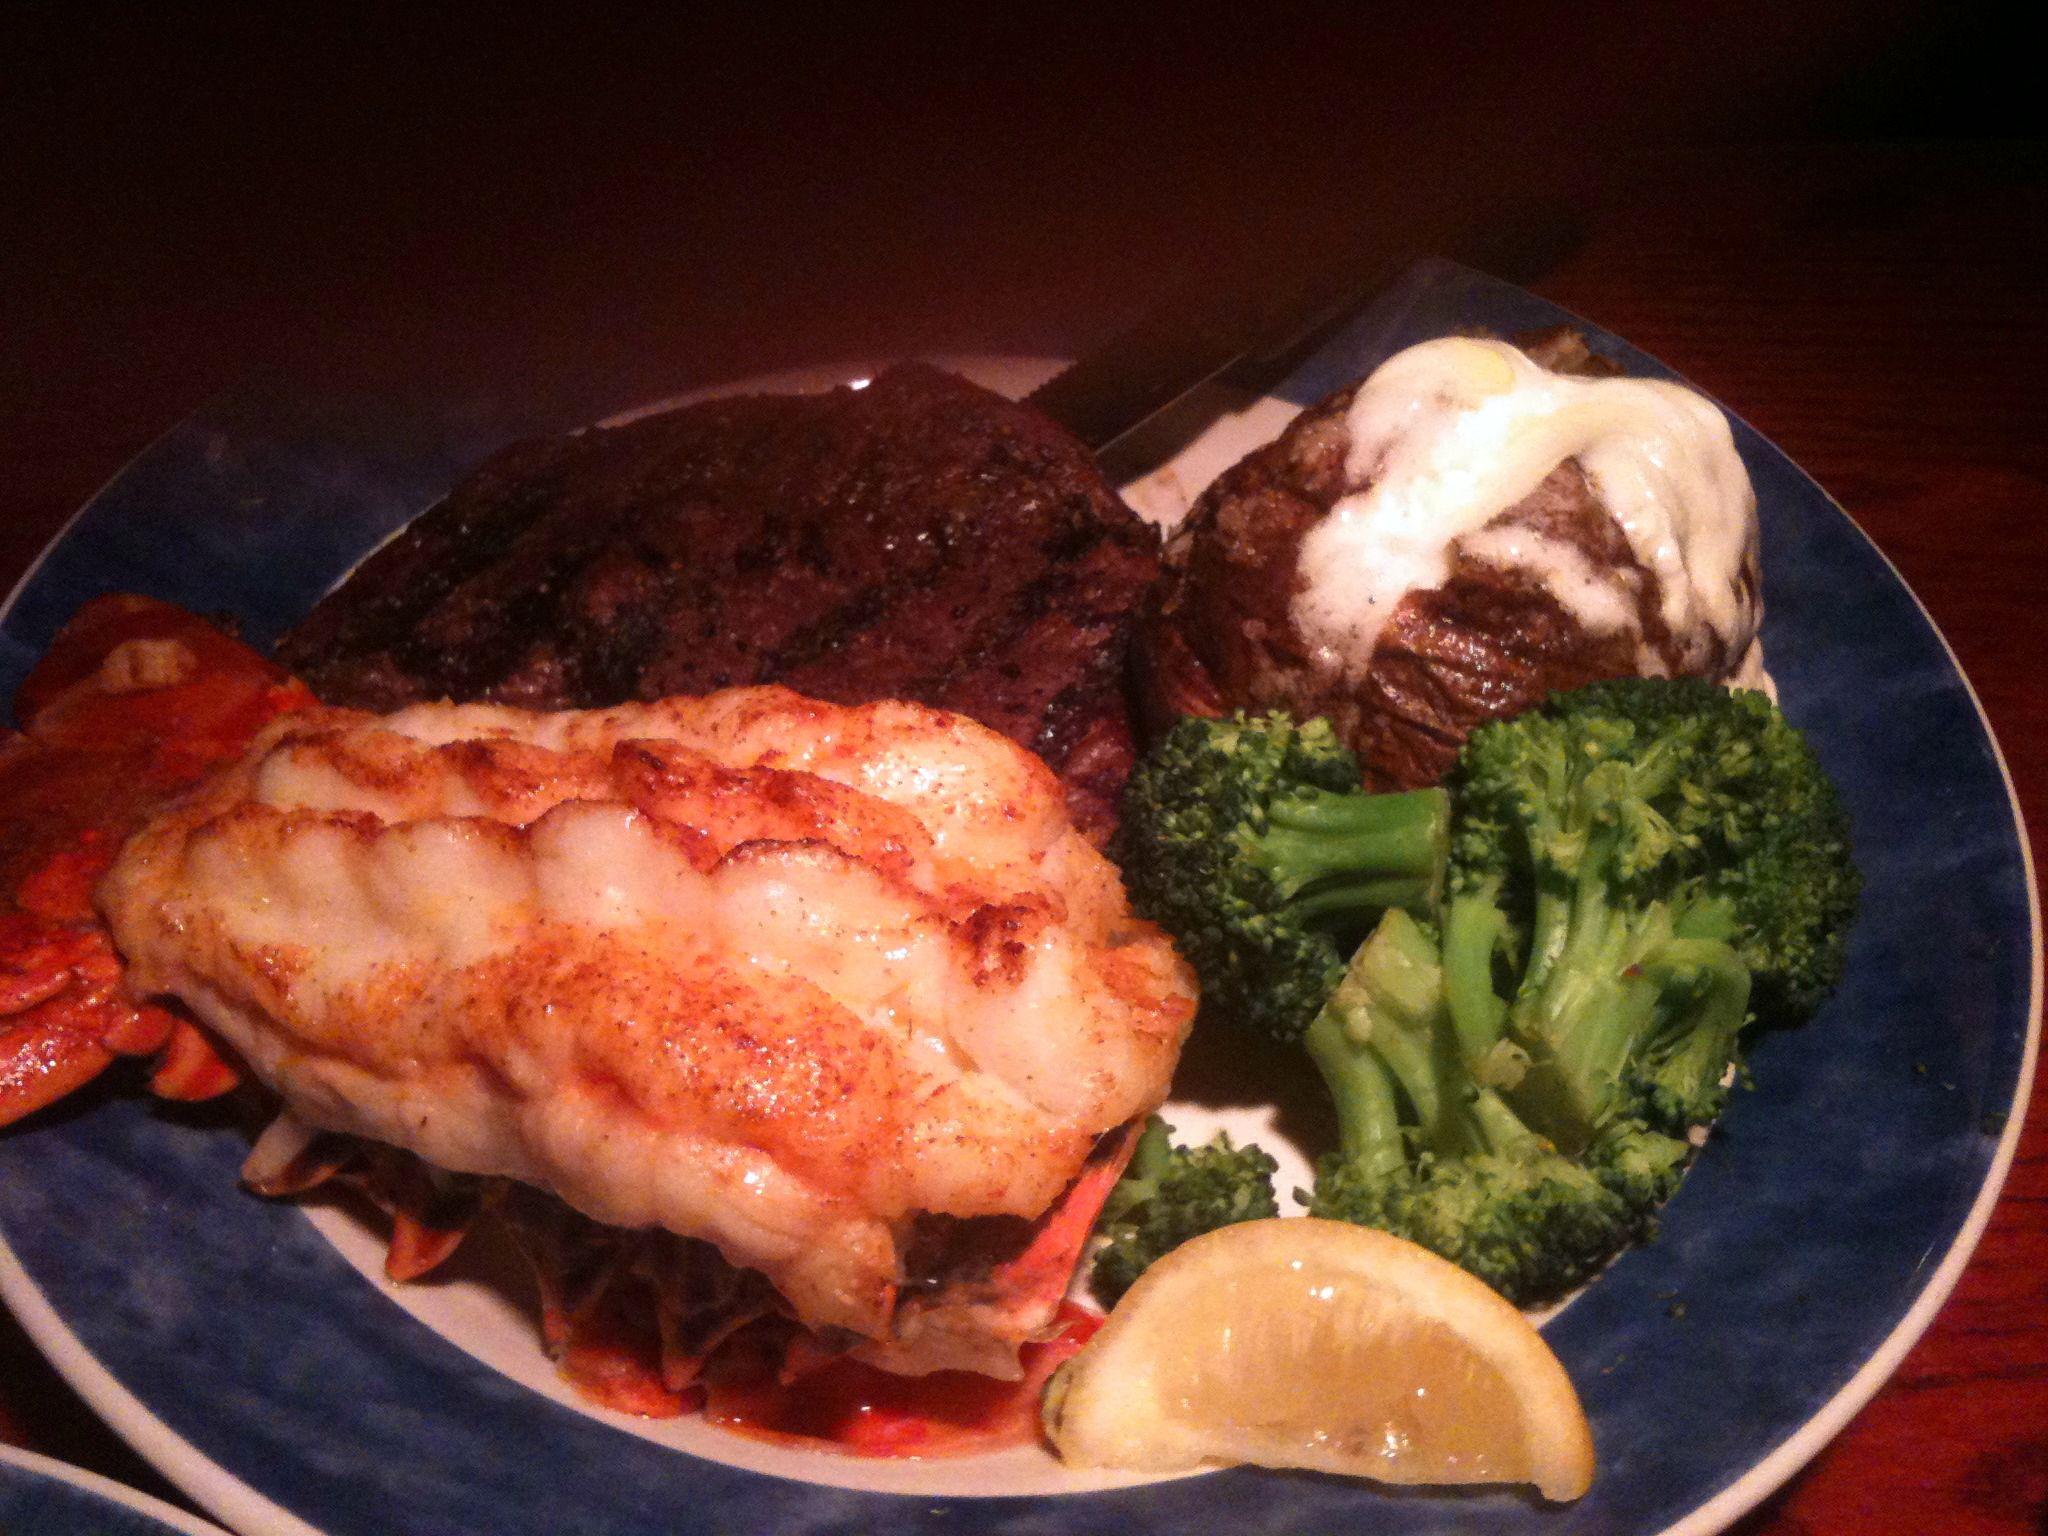 Steak & Lobster! | Romantic Dinner | Food, Ethnic recipes ...